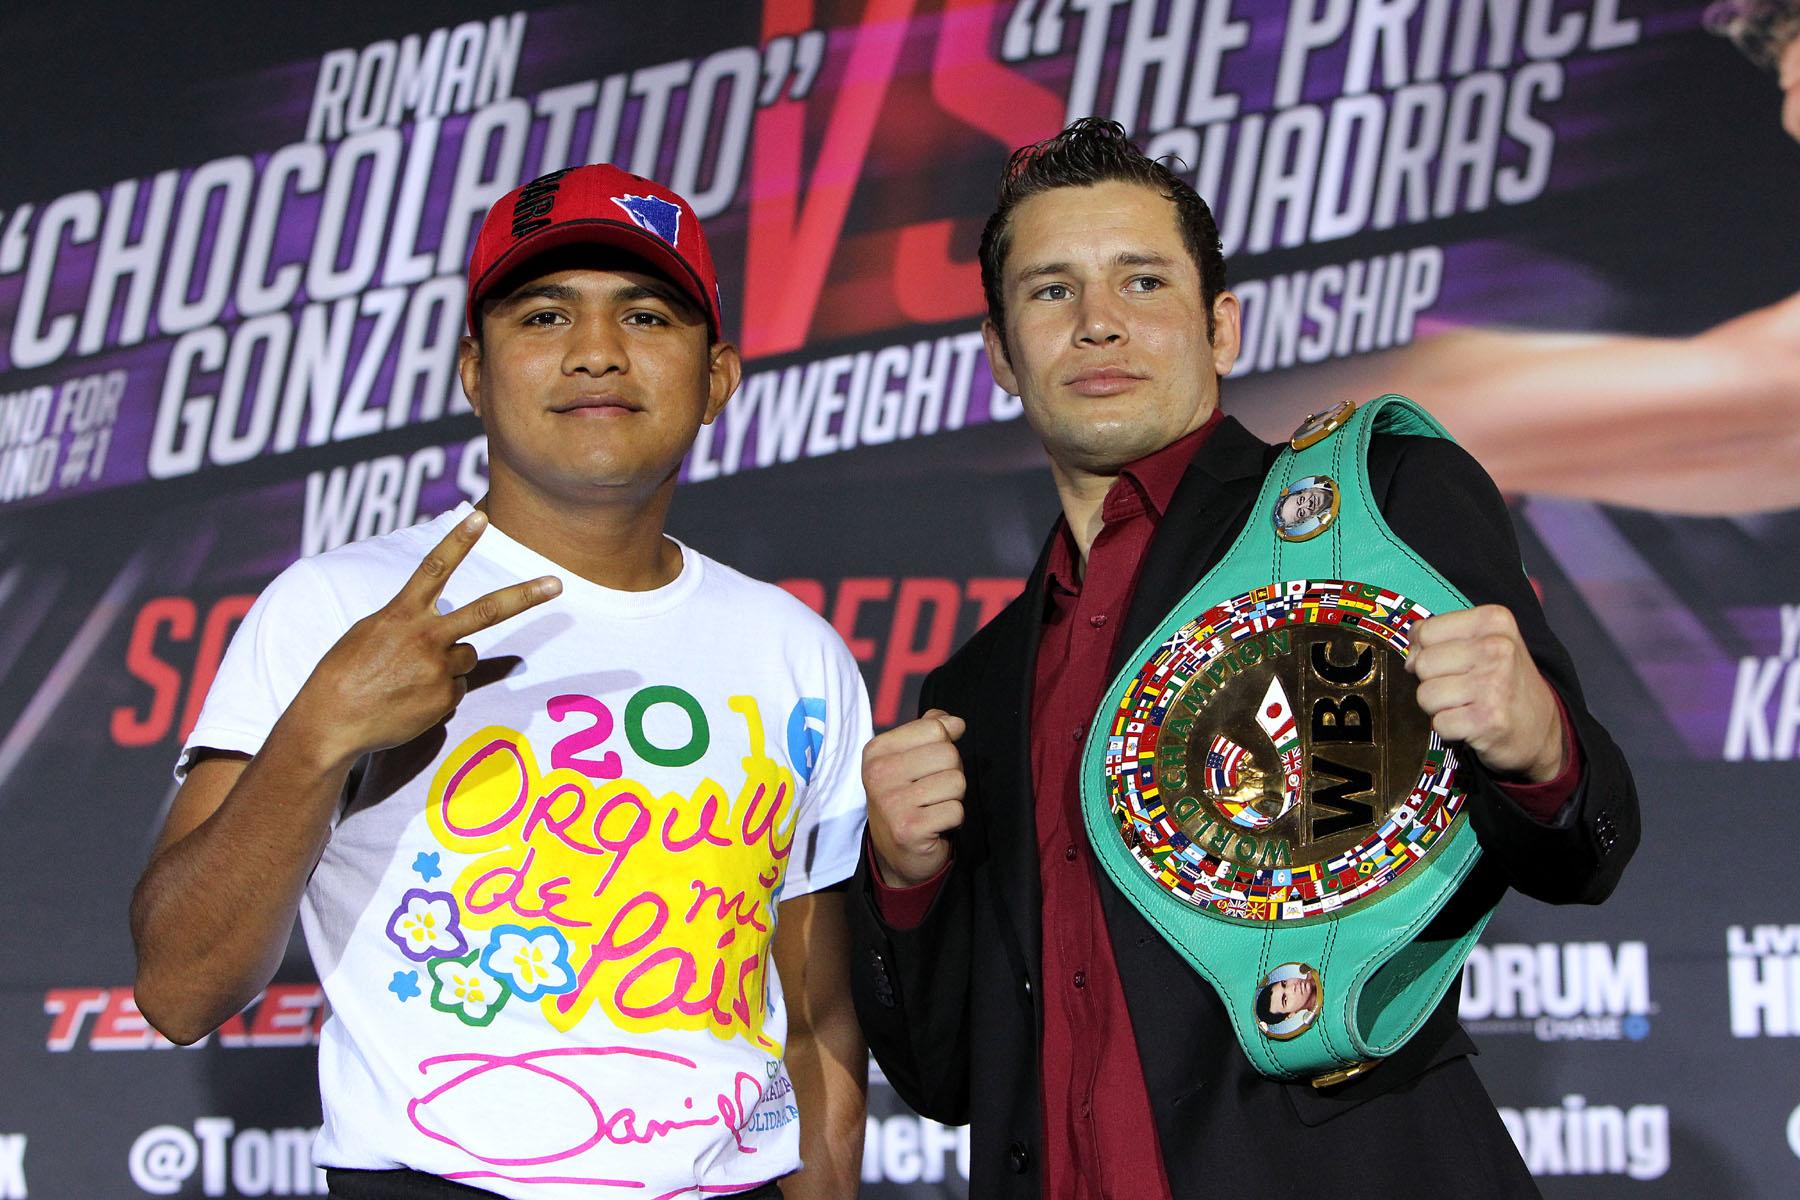 Román González se enfrenta a Carlso Cuadras el 10 de septiembre. (Chris Farina/K2 Promotions)